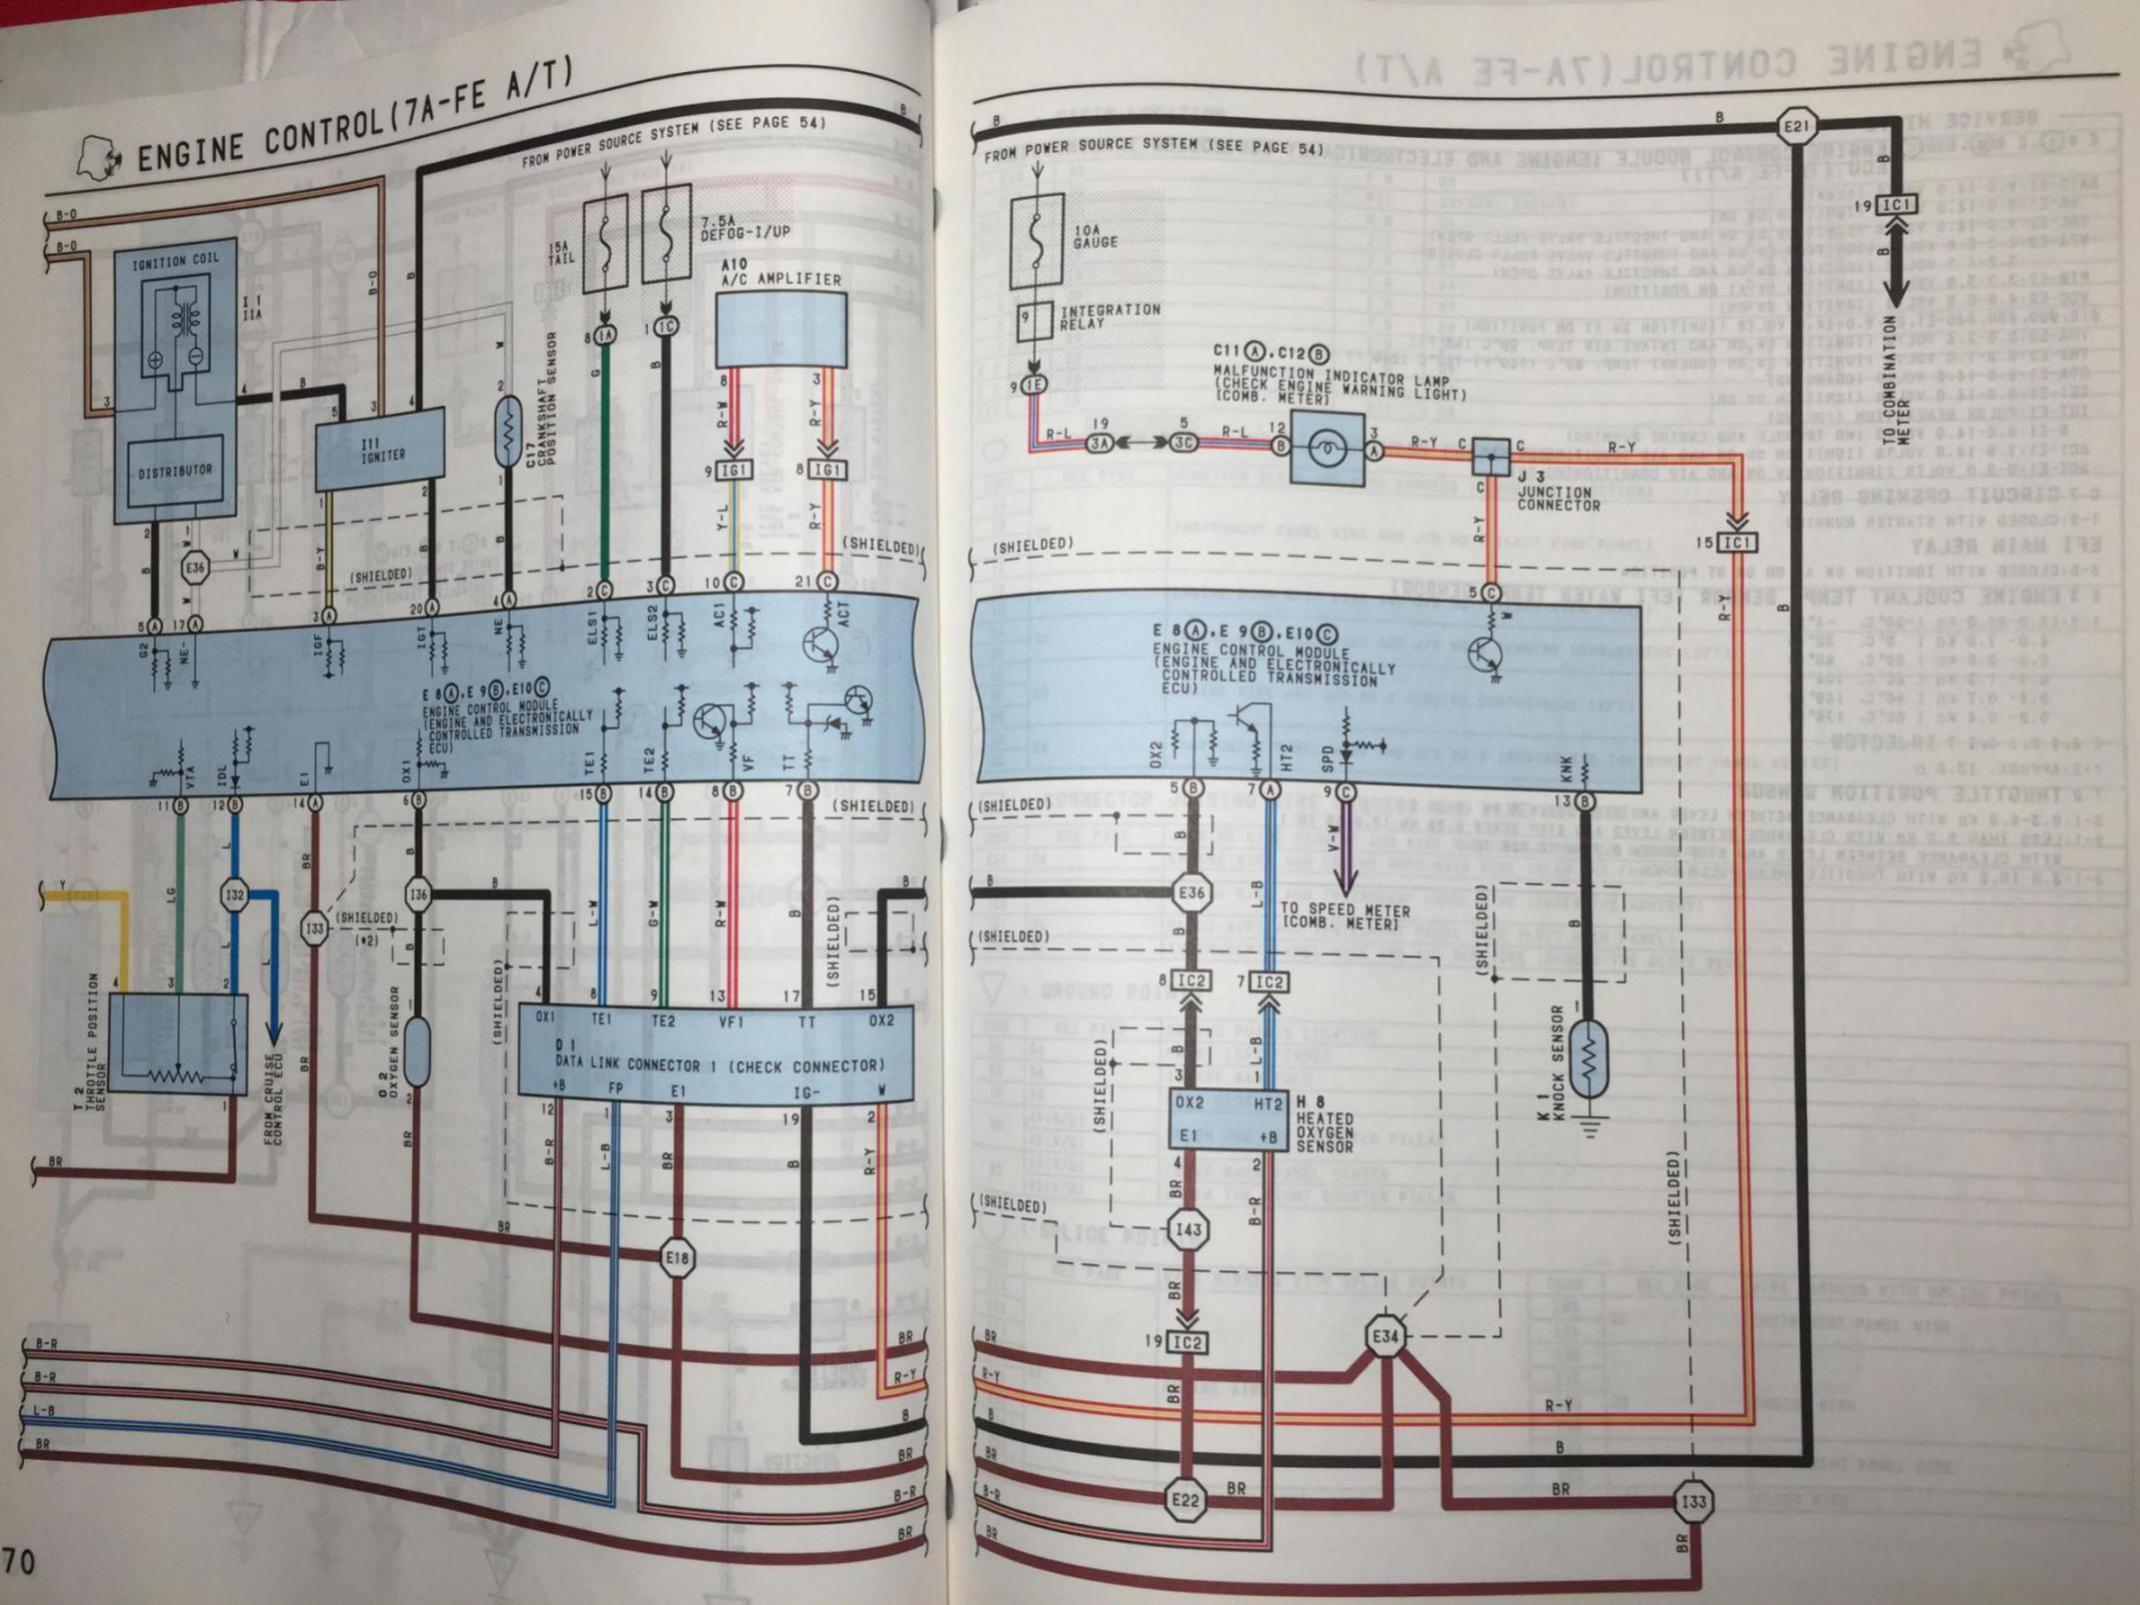 95 corolla belt diagram, 95 corolla gas tank, 95 corolla fuel pump relay, on 95 corolla fuse box engine